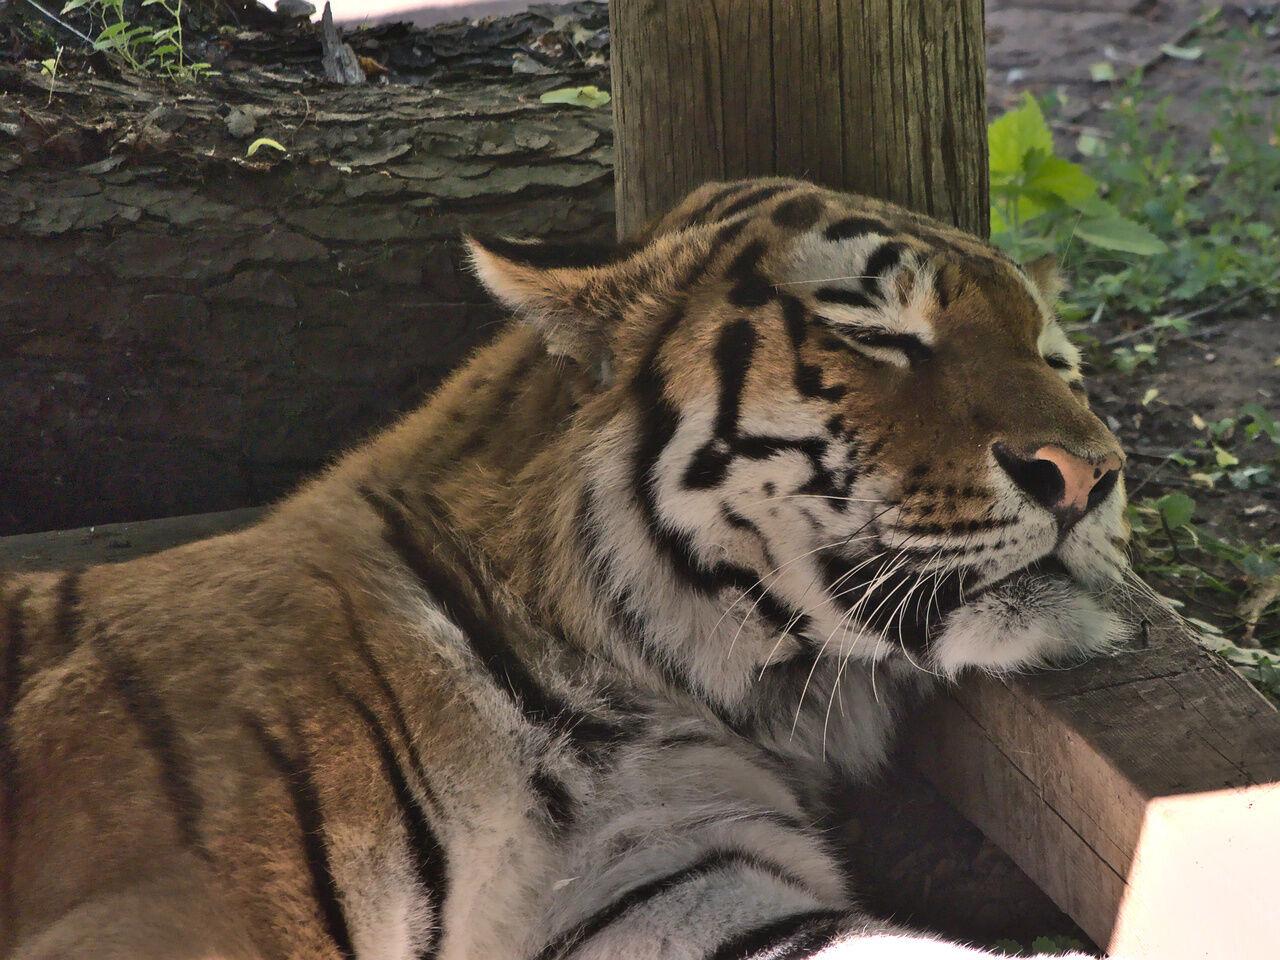 20200524_Zoo_Landau_001